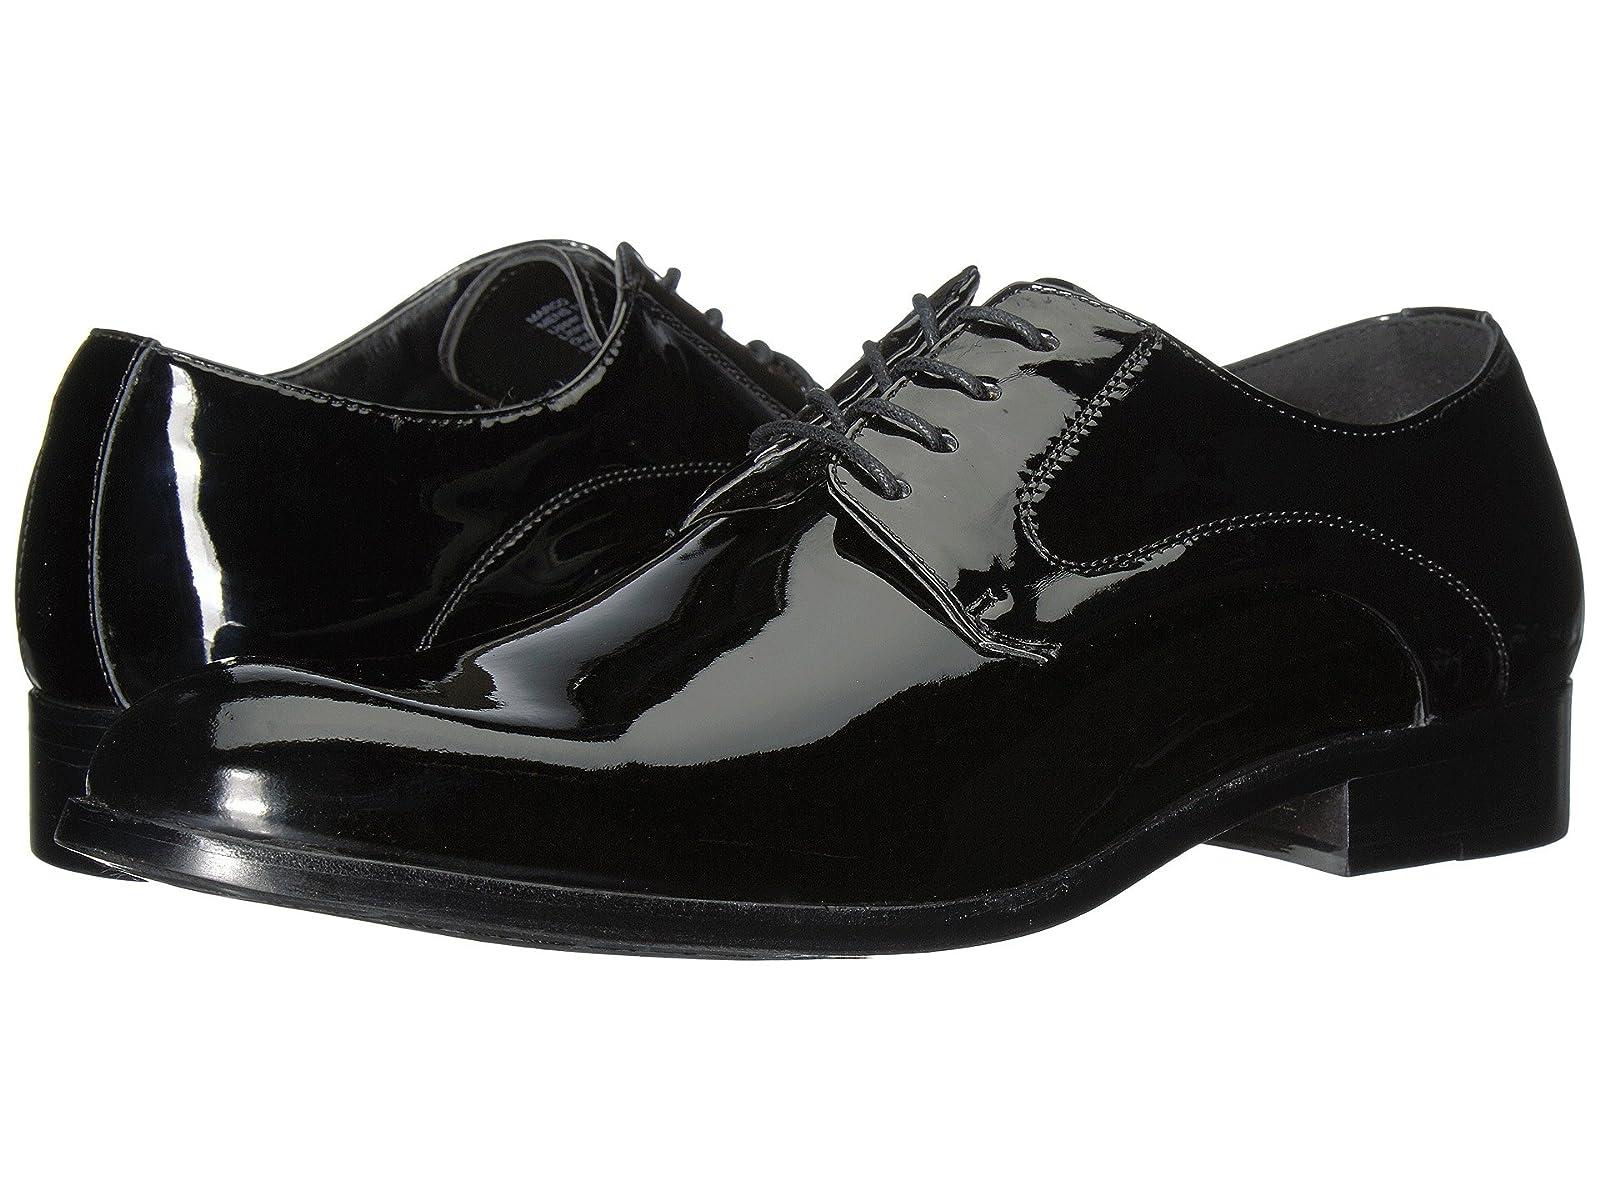 Tallia Orange MarcoAtmospheric grades have affordable shoes